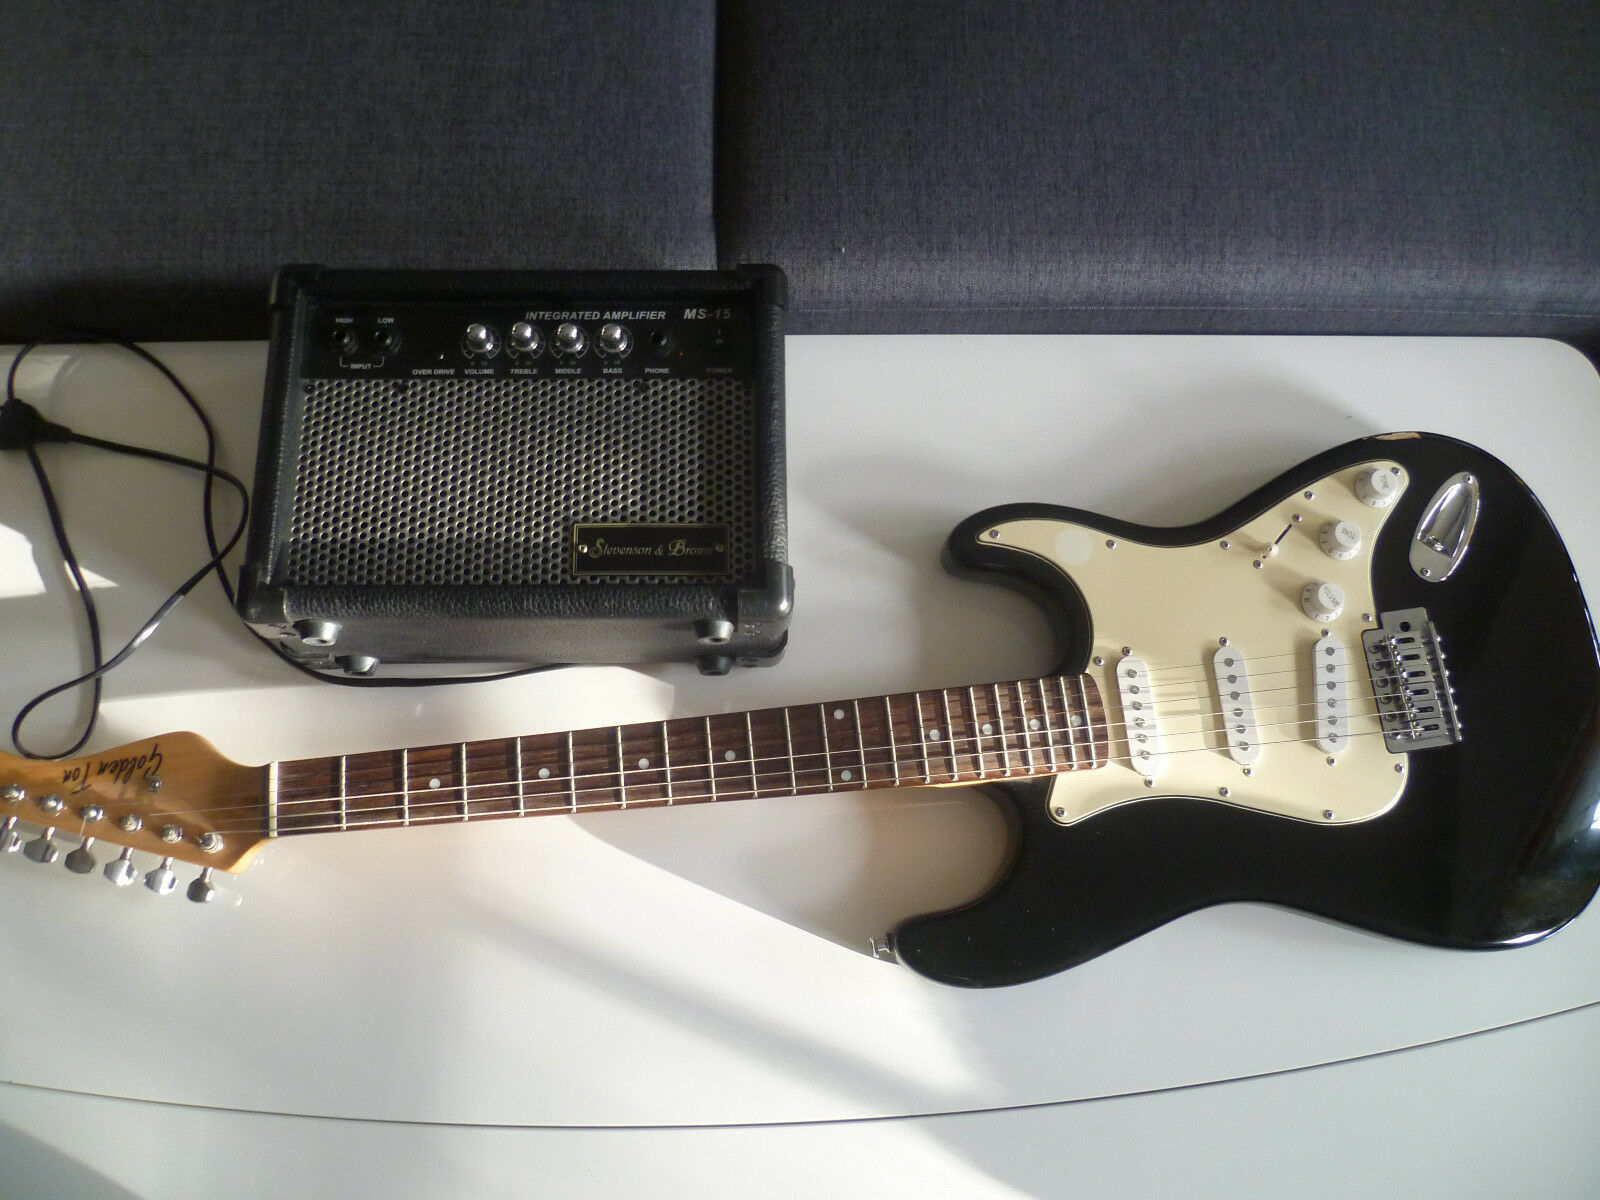 E Gitarre Golden Ton und top Stevenson & braun MS 15 Verstärker